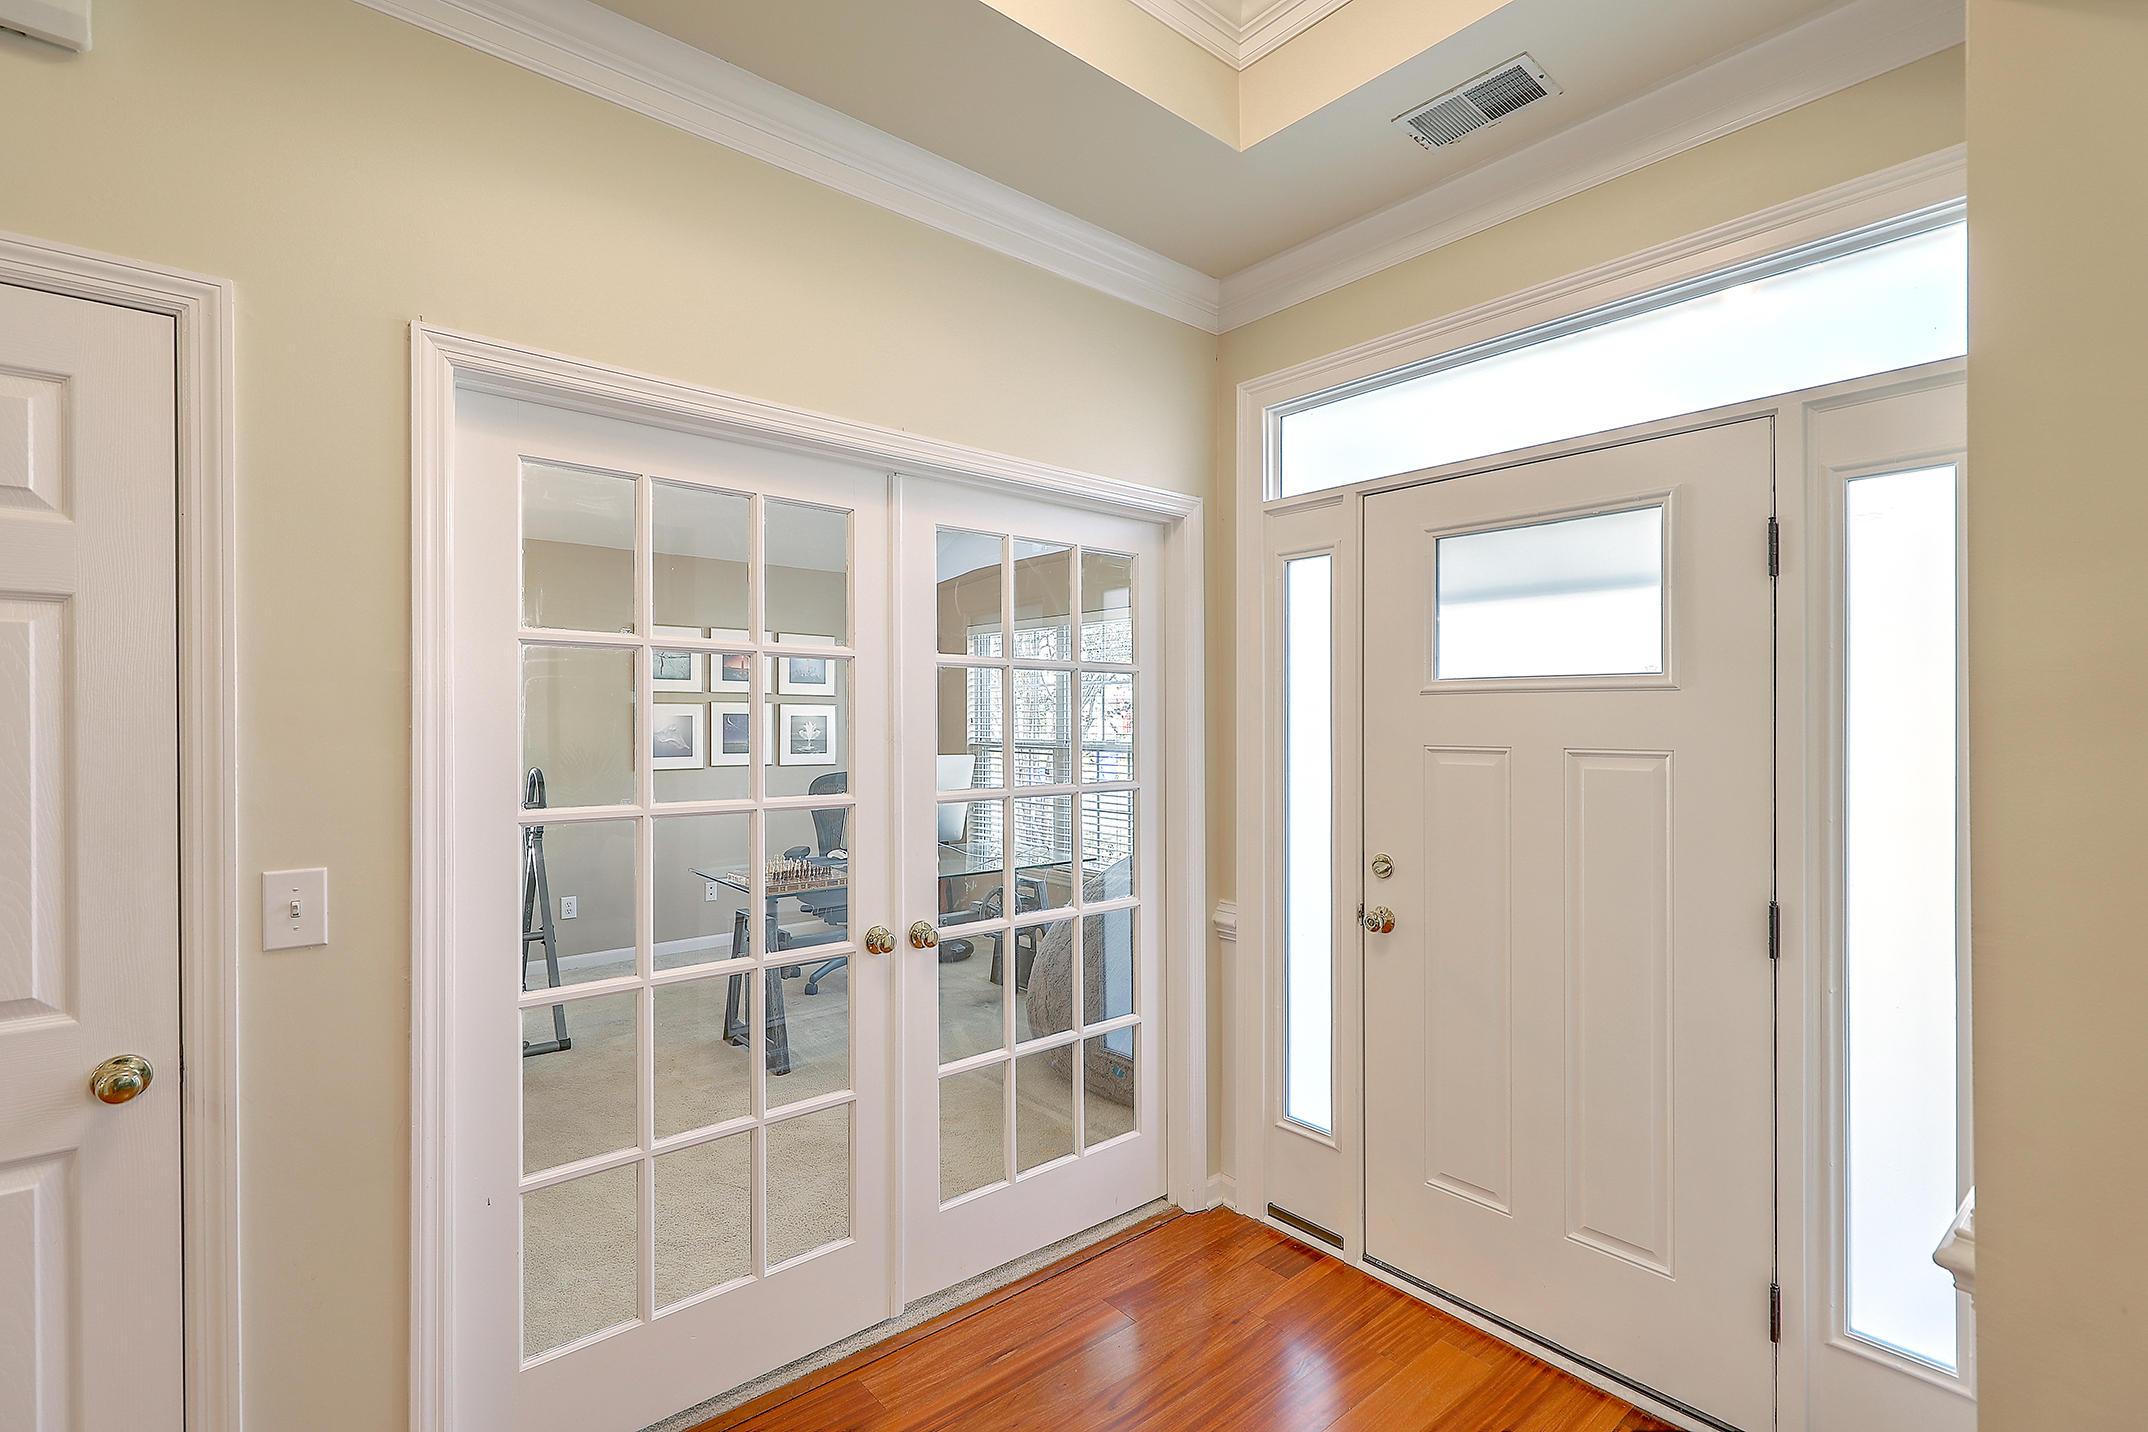 Dunes West Homes For Sale - 1471 Cypress Pointe, Mount Pleasant, SC - 9